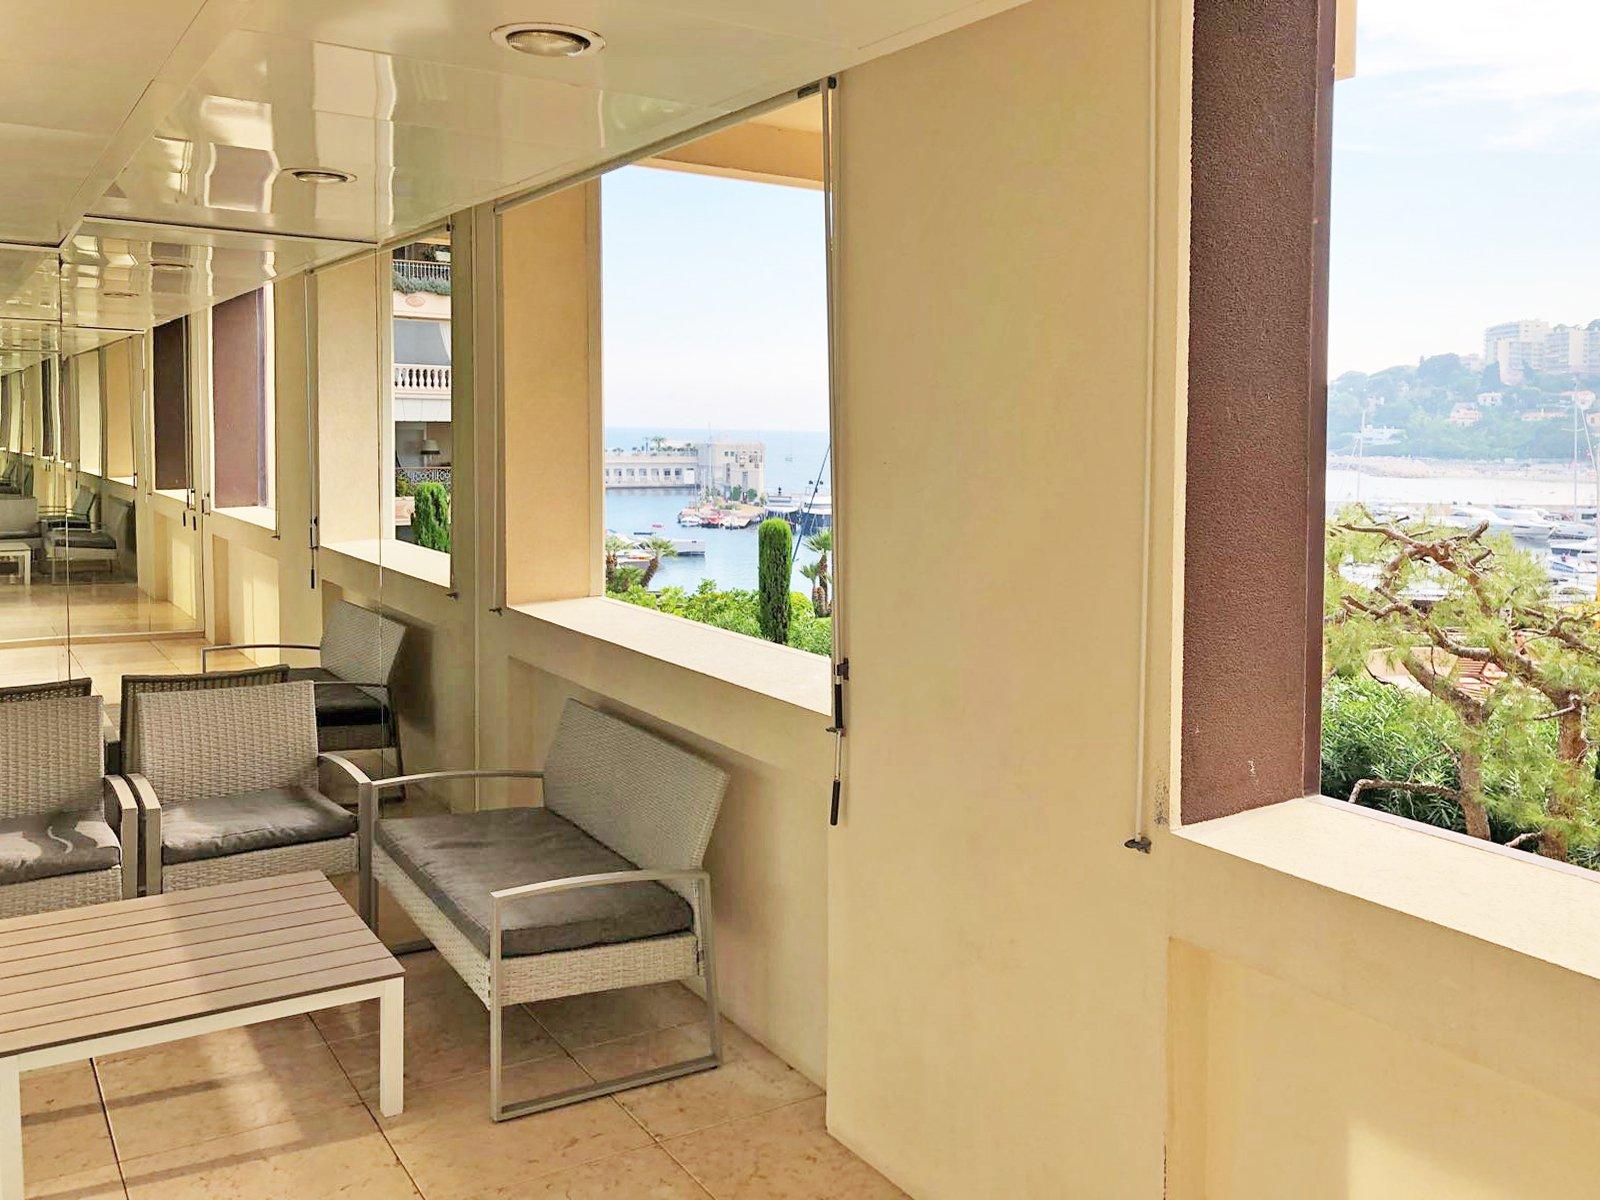 Seaside Plaza - Renovated One Bedroom